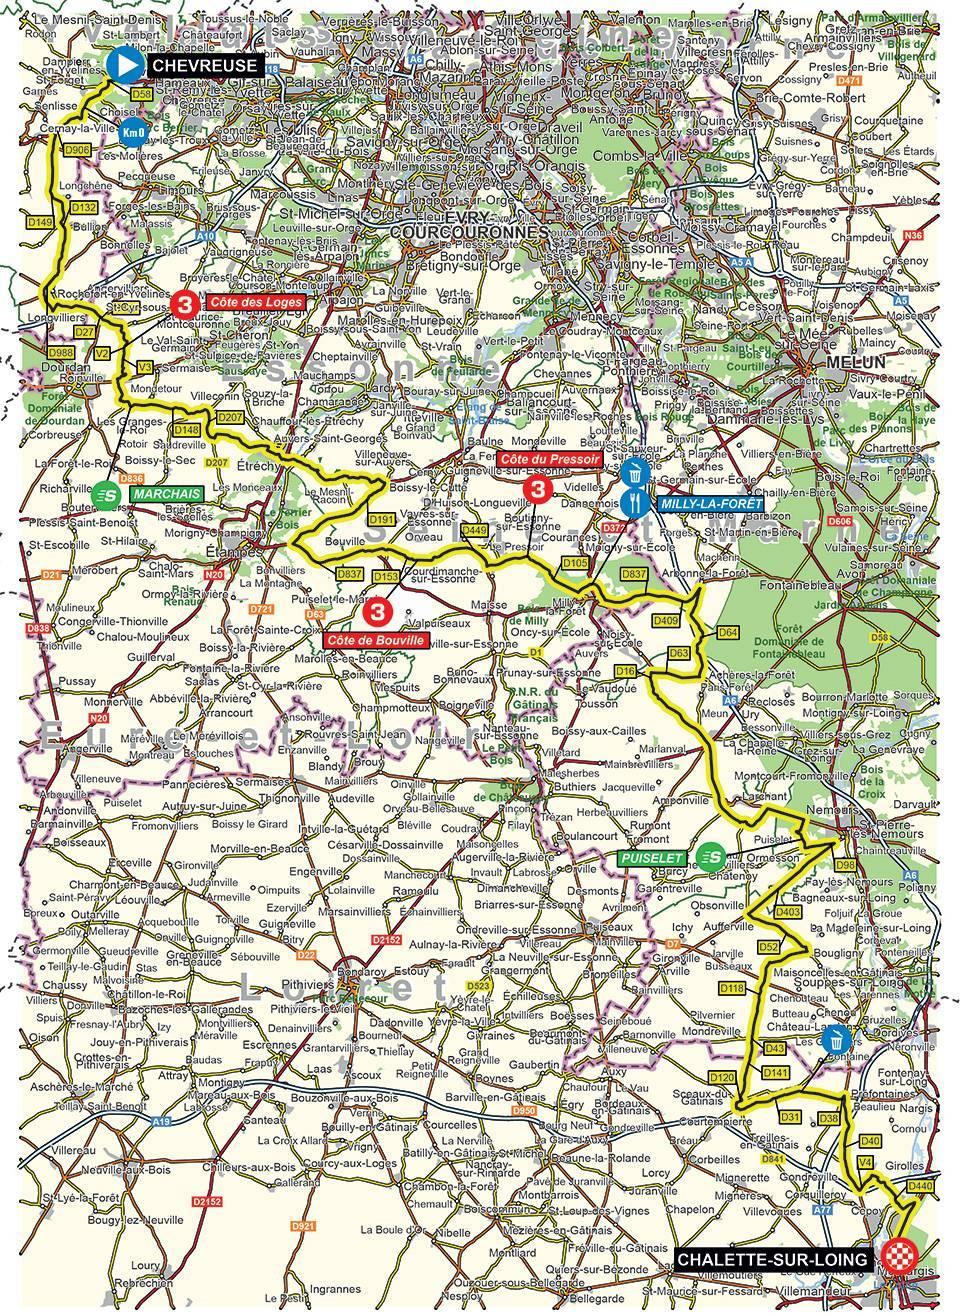 Streckenverlauf Paris - Nice 2020 - Etappe 2